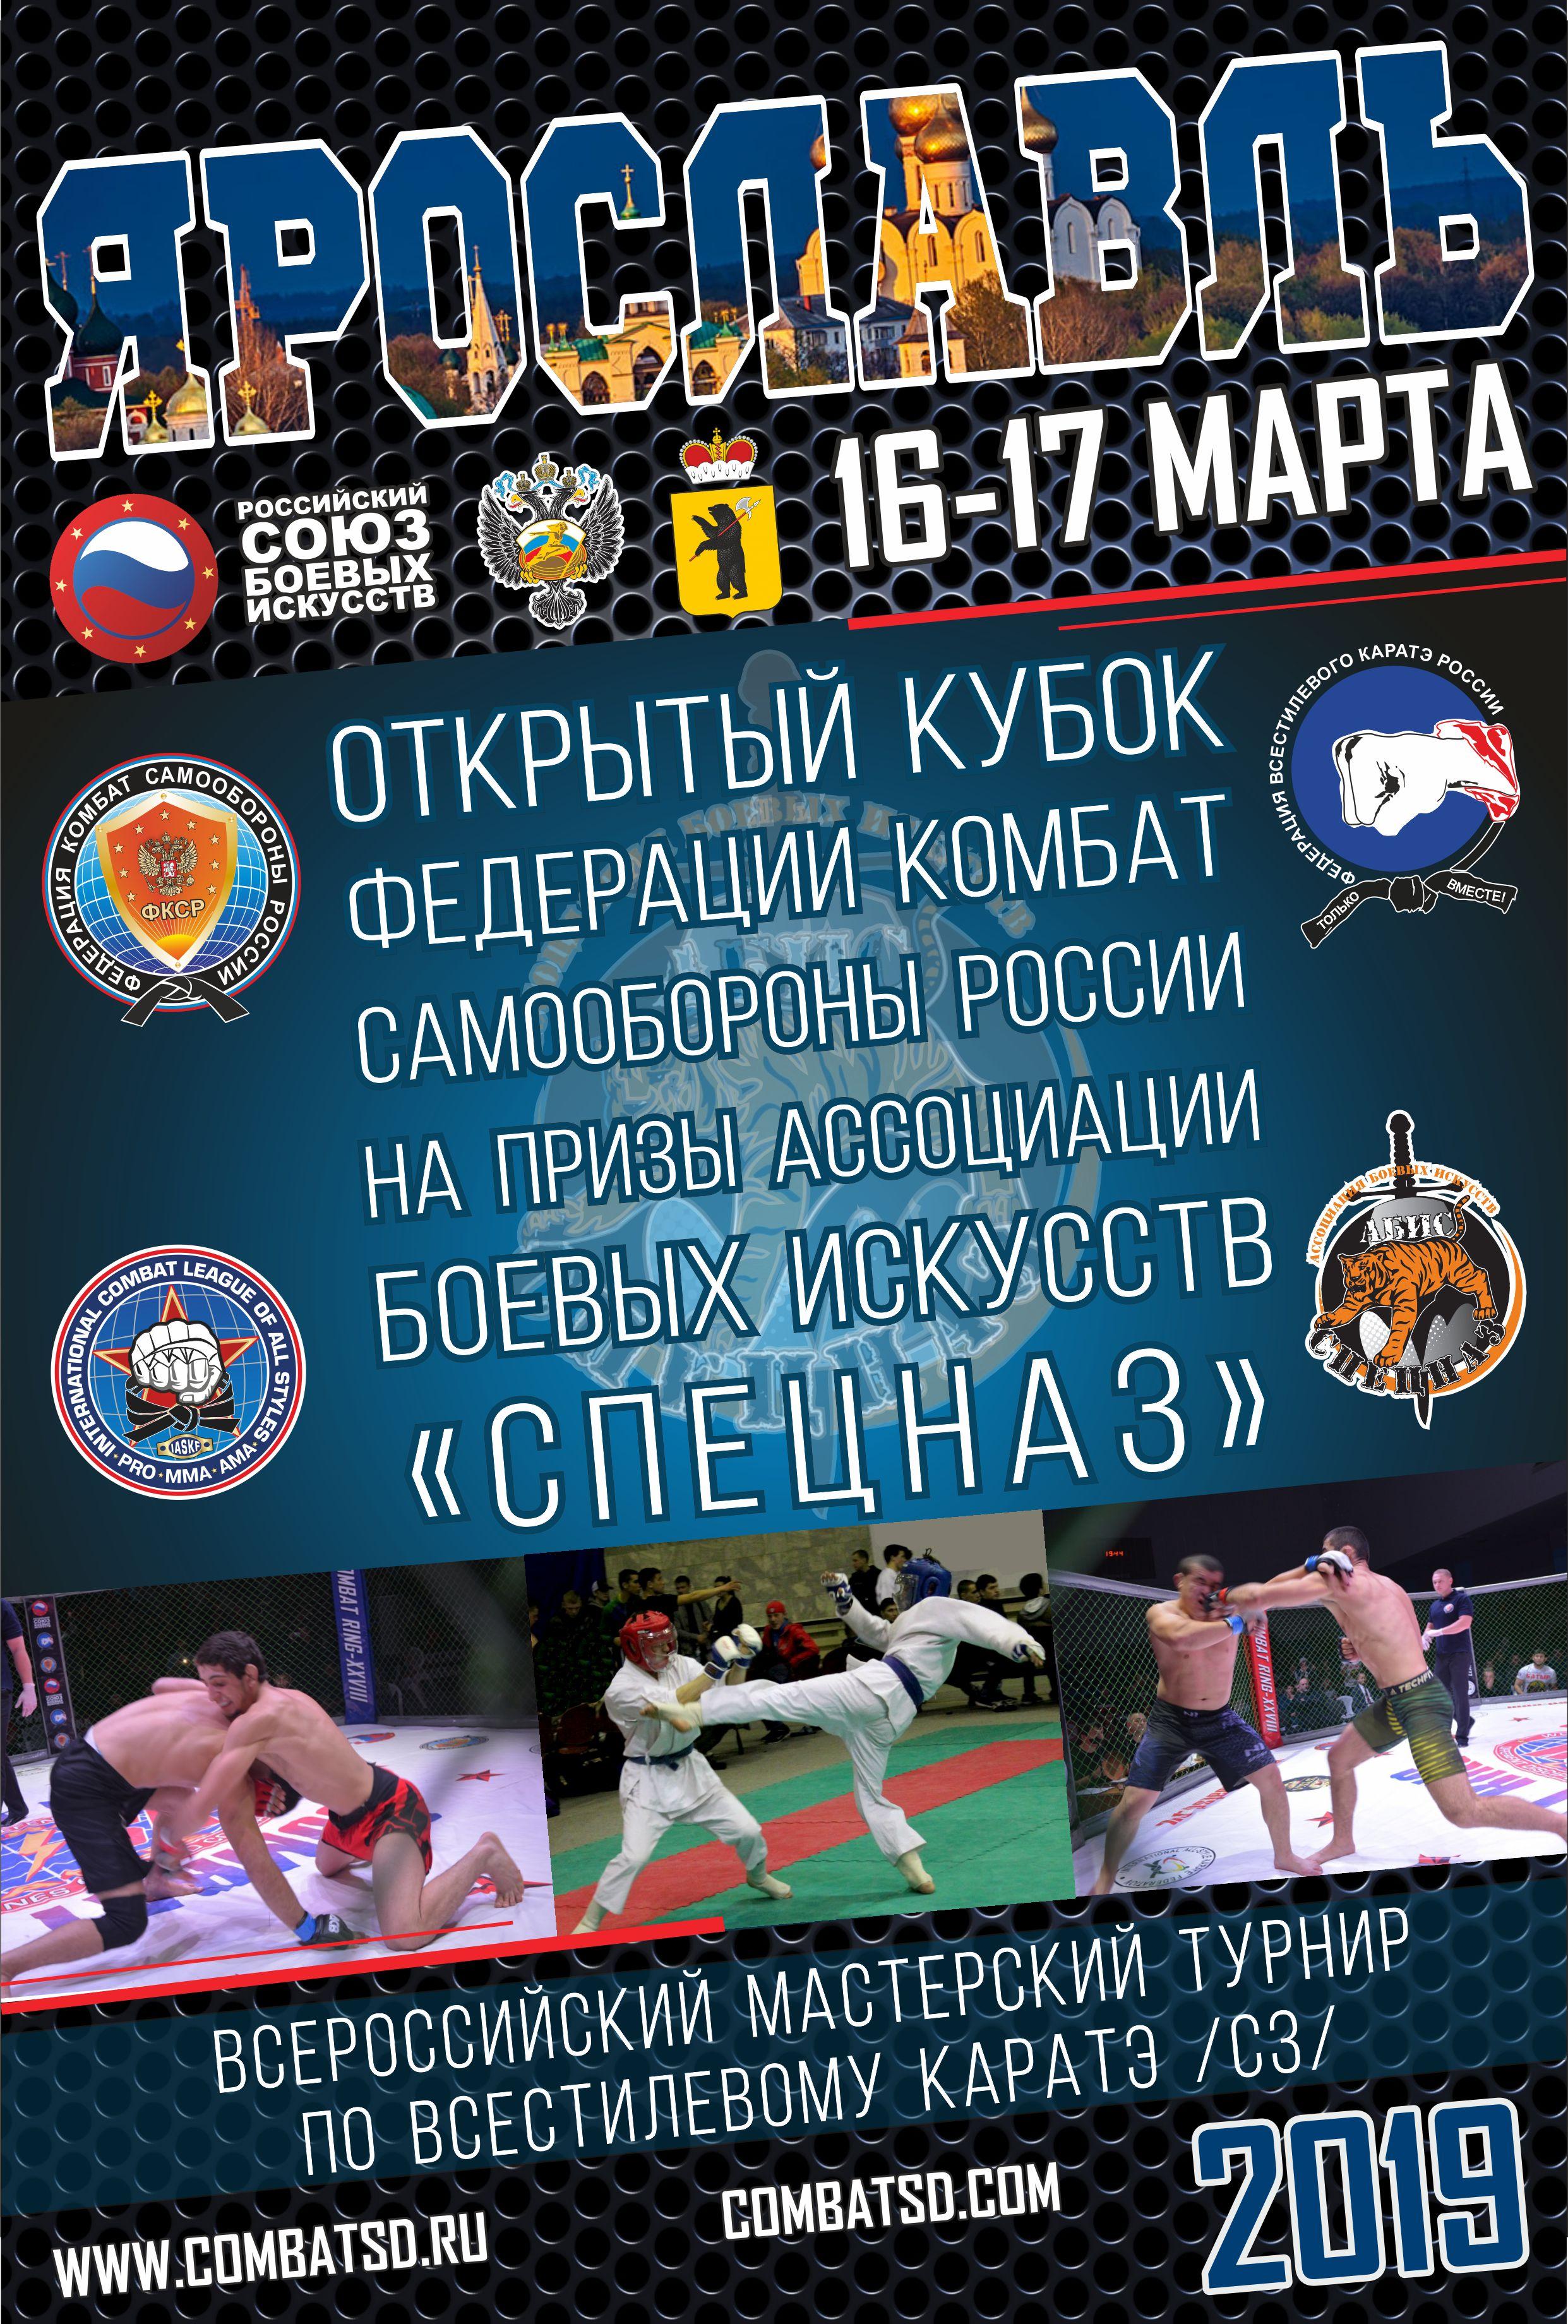 http://combatsd.ru/images/upload/Афиша1..jpg